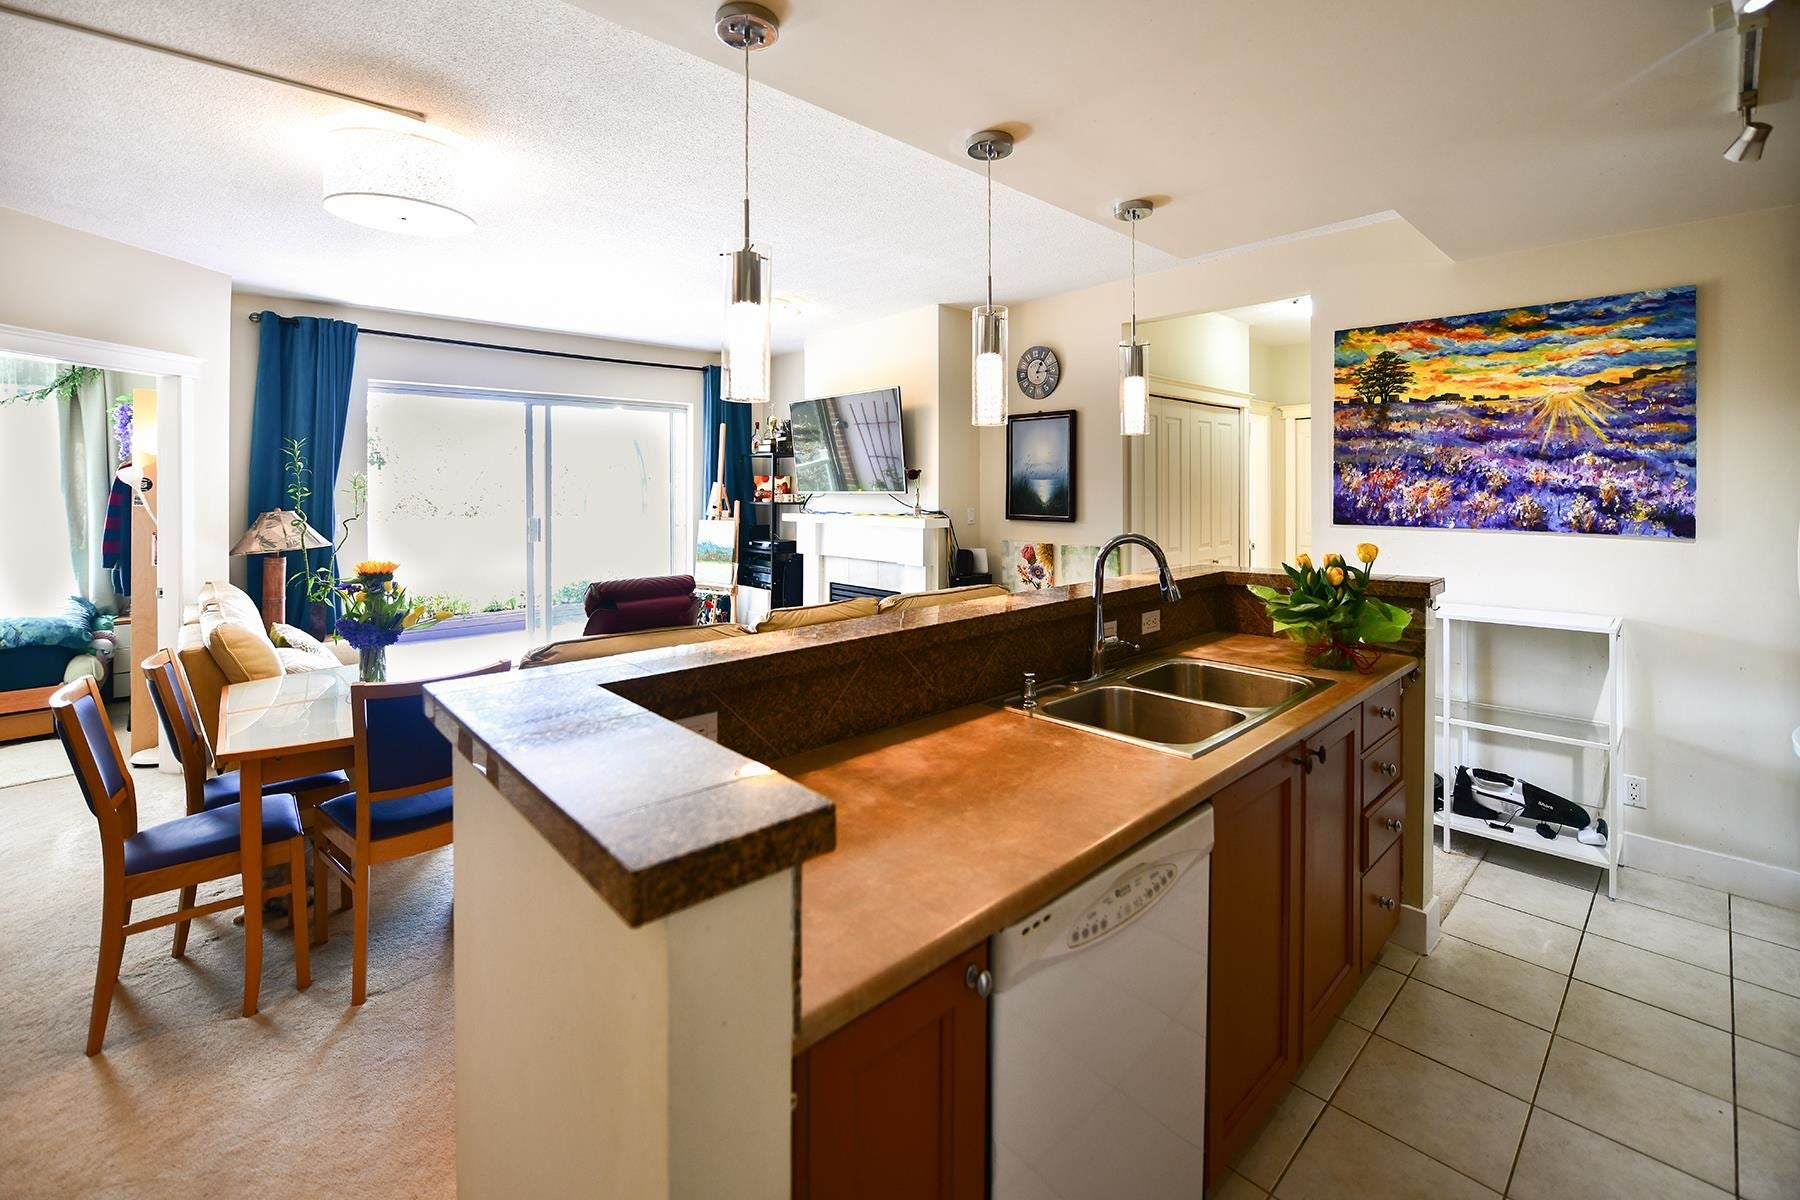 204 5790 EAST BOULEVARD - Kerrisdale Apartment/Condo for sale, 3 Bedrooms (R2604138) - #8